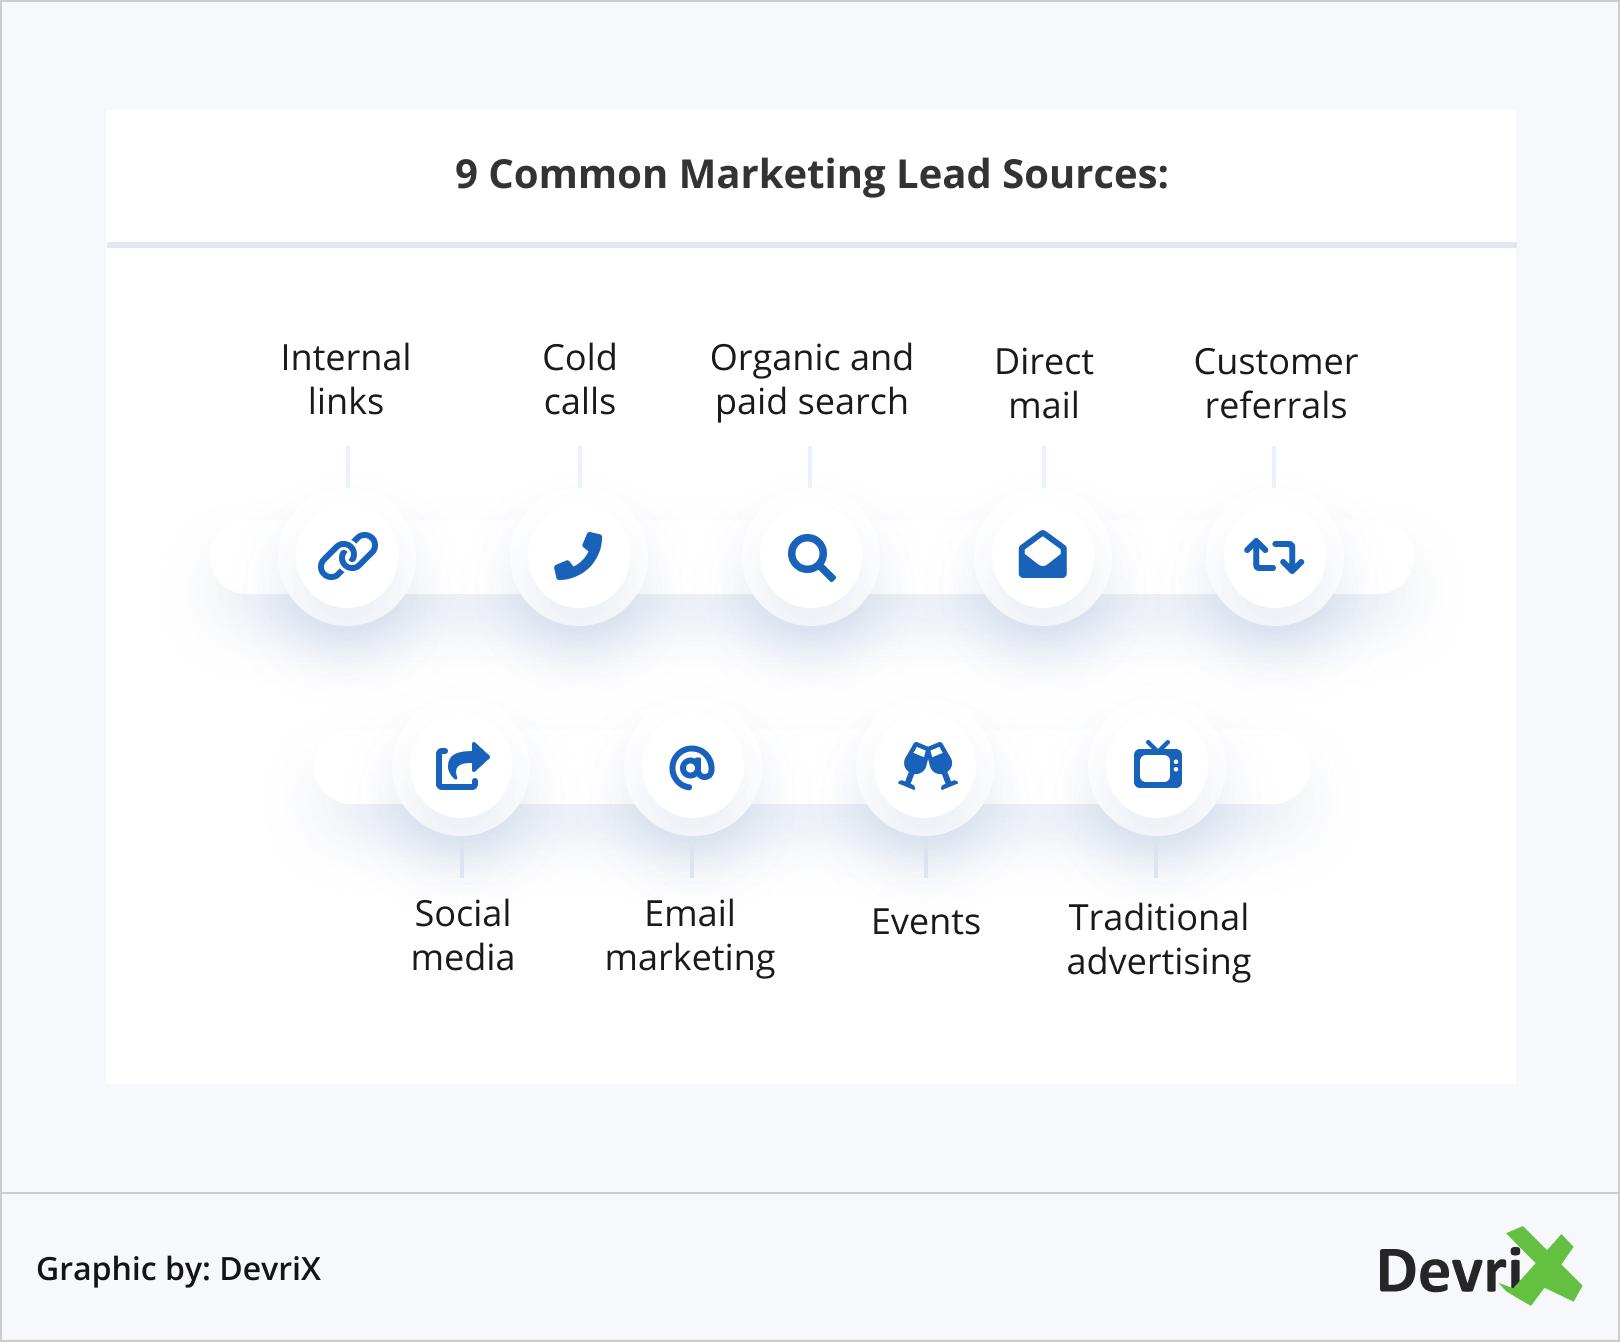 9 Common Marketing Lead Sources